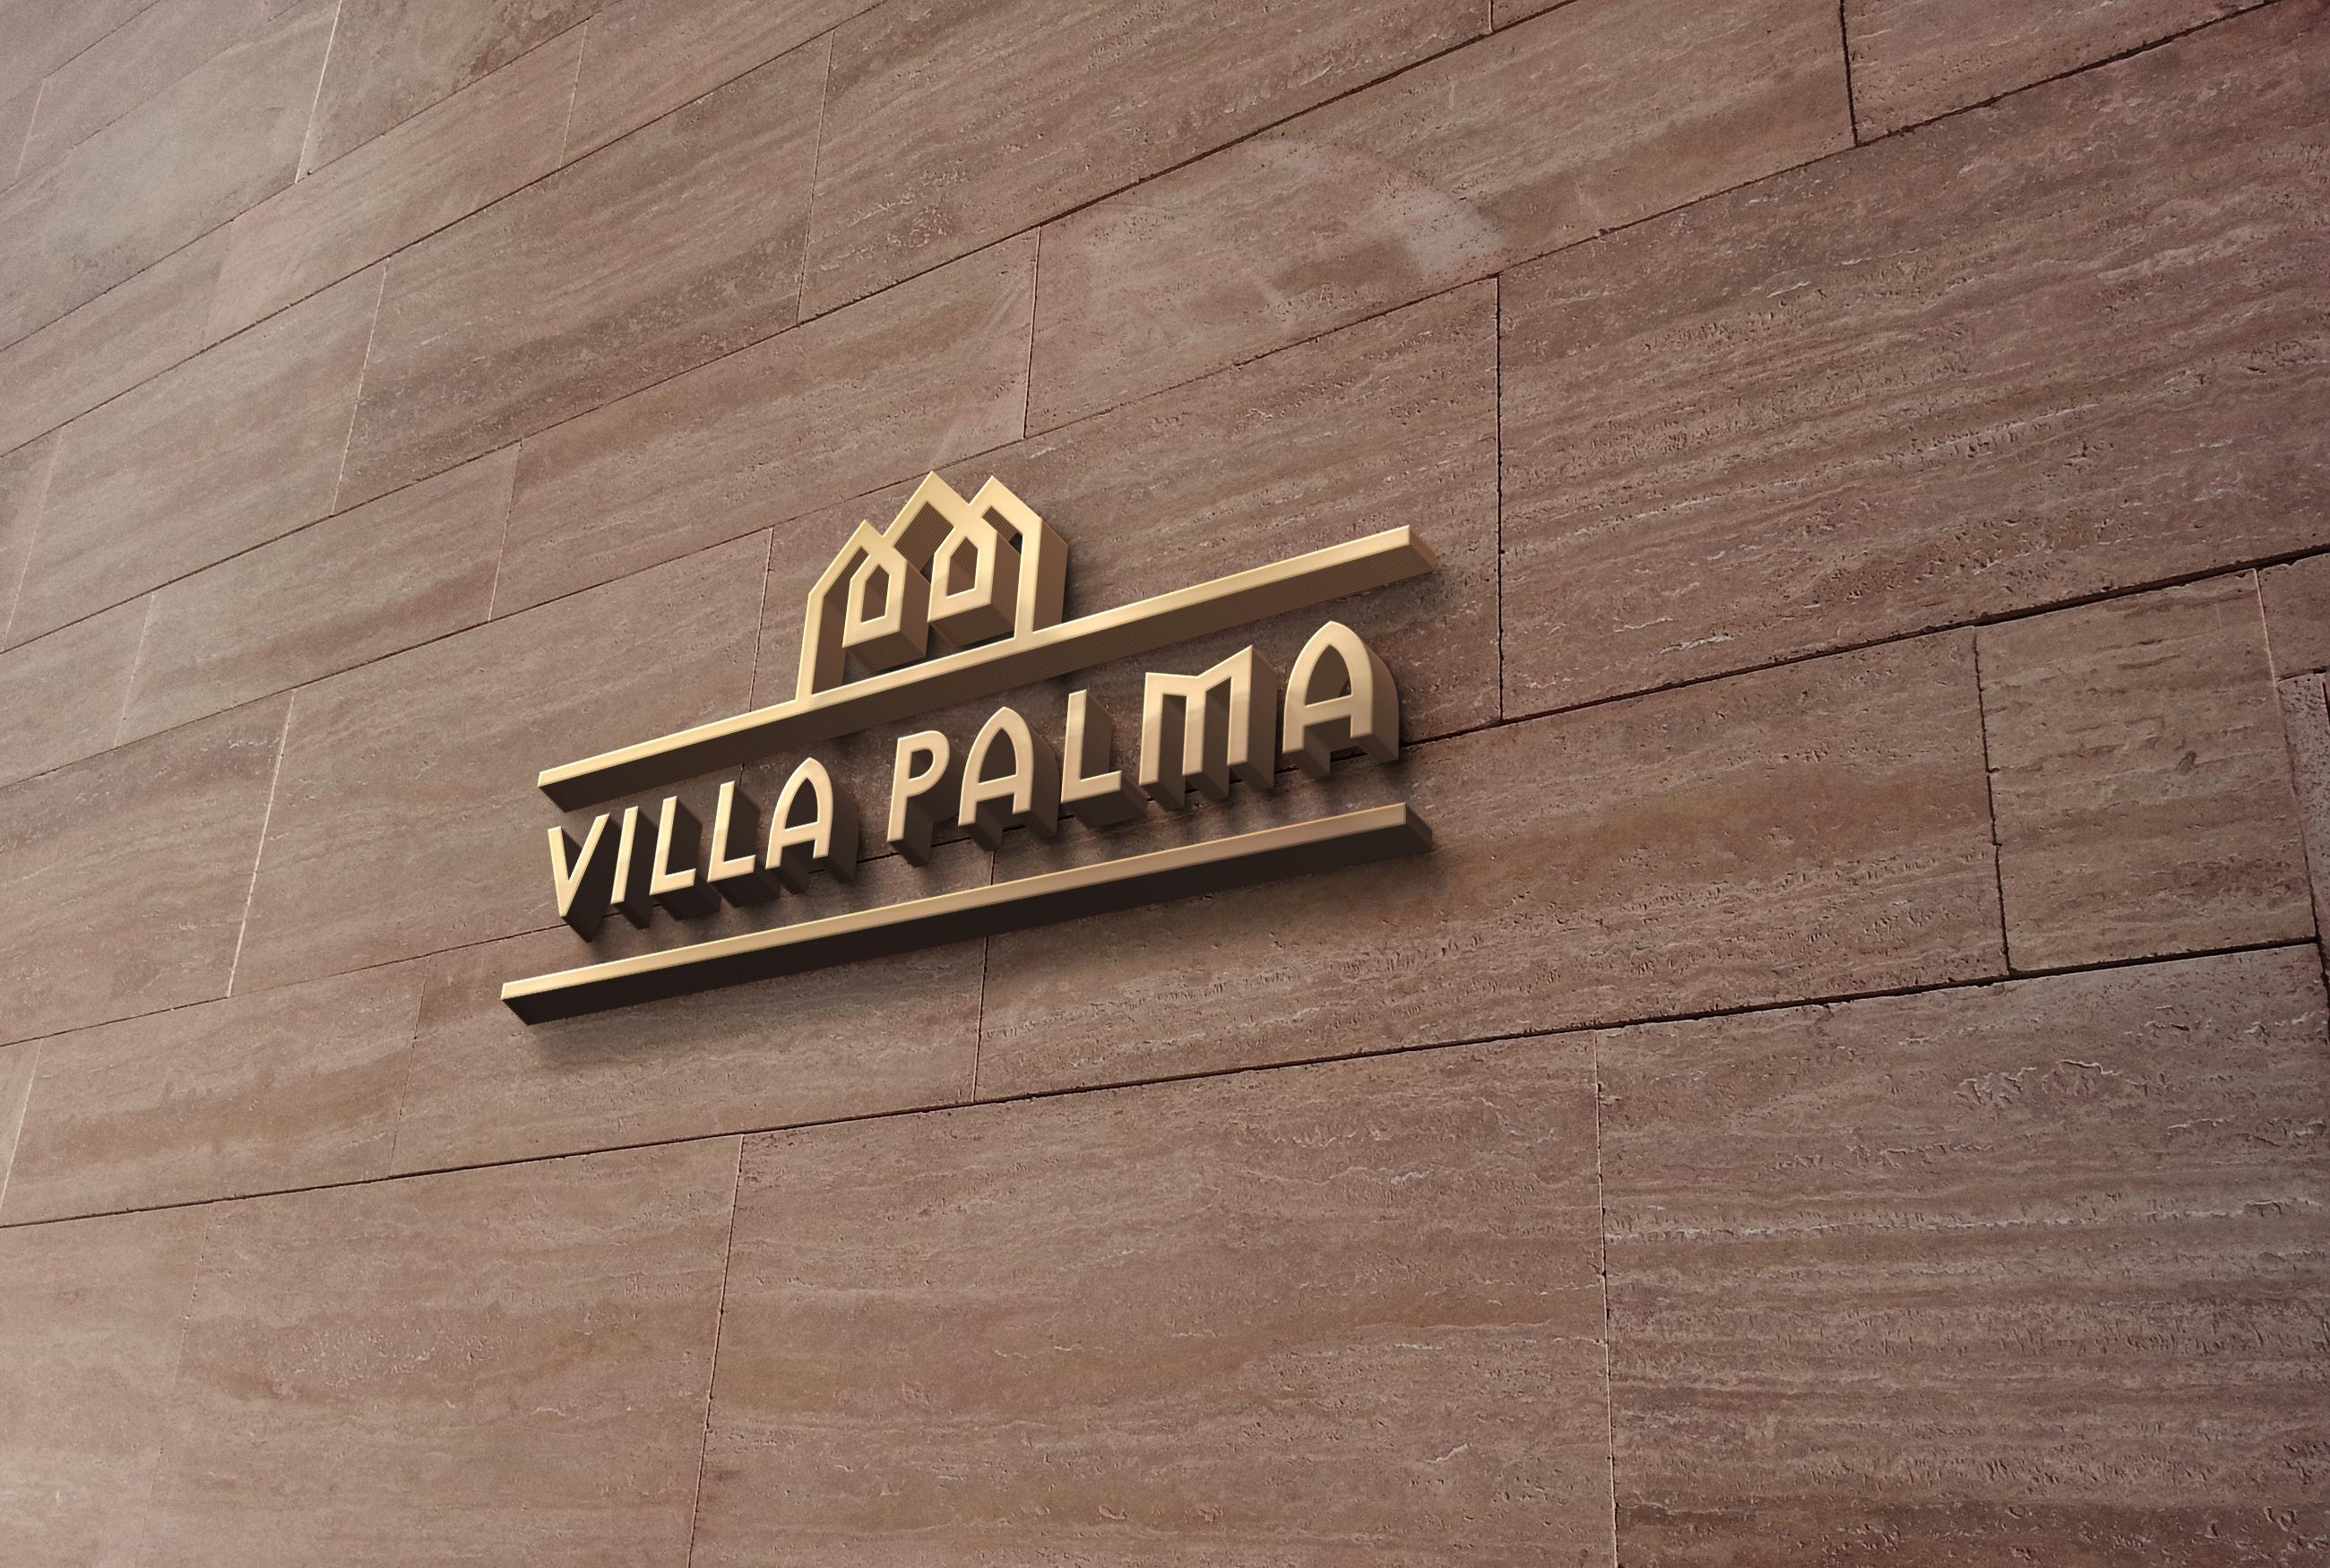 Villa Palma Signage